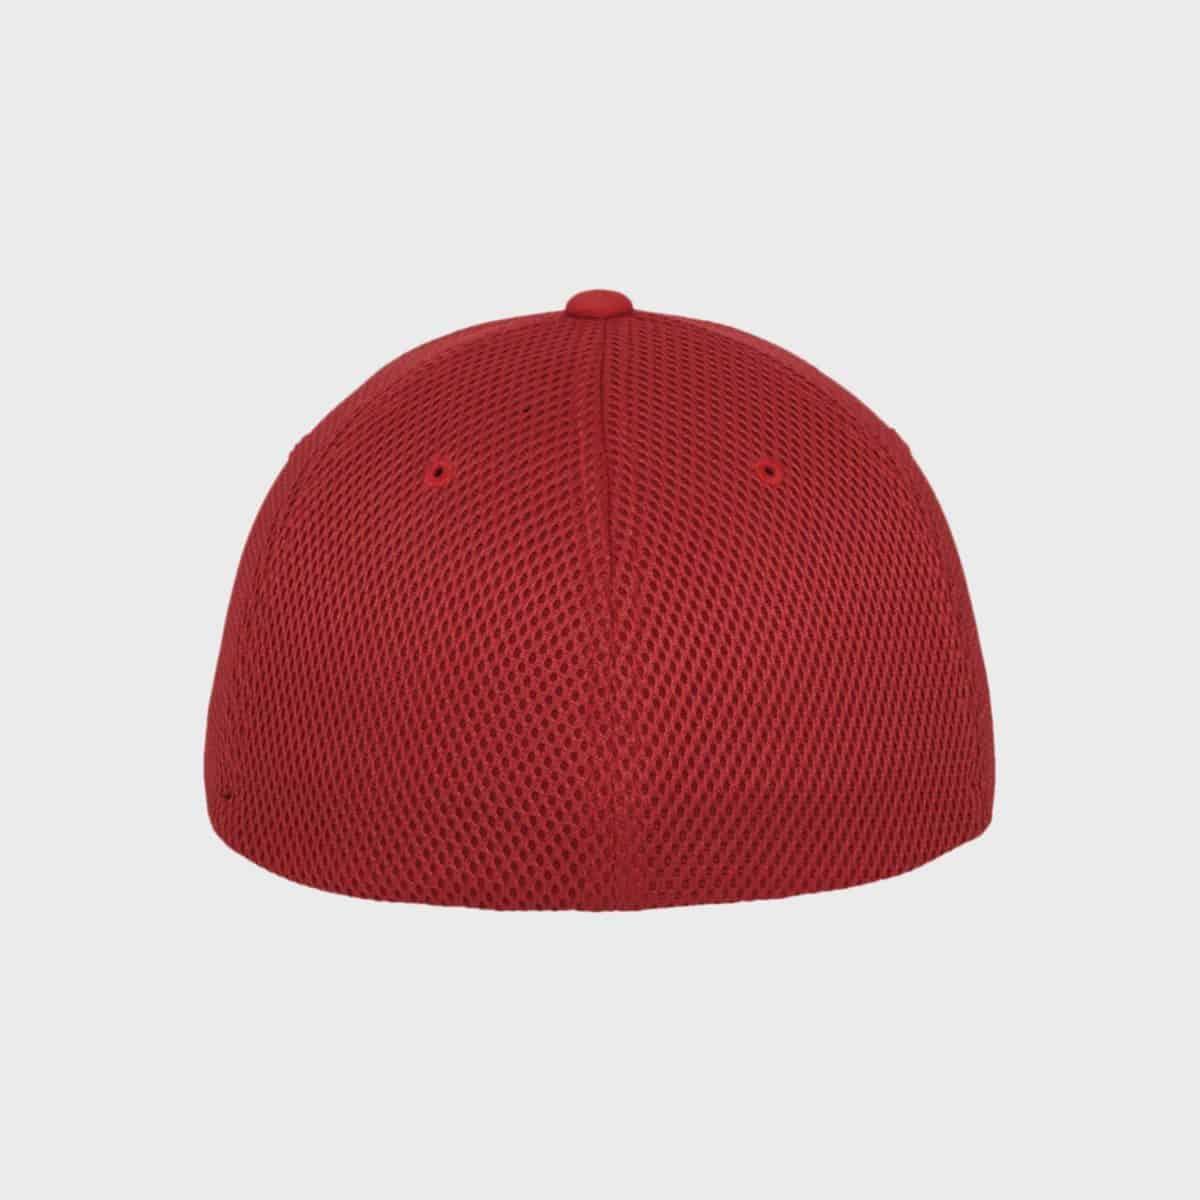 Flexfit FlexfitCaps FFE 6533 Red Back